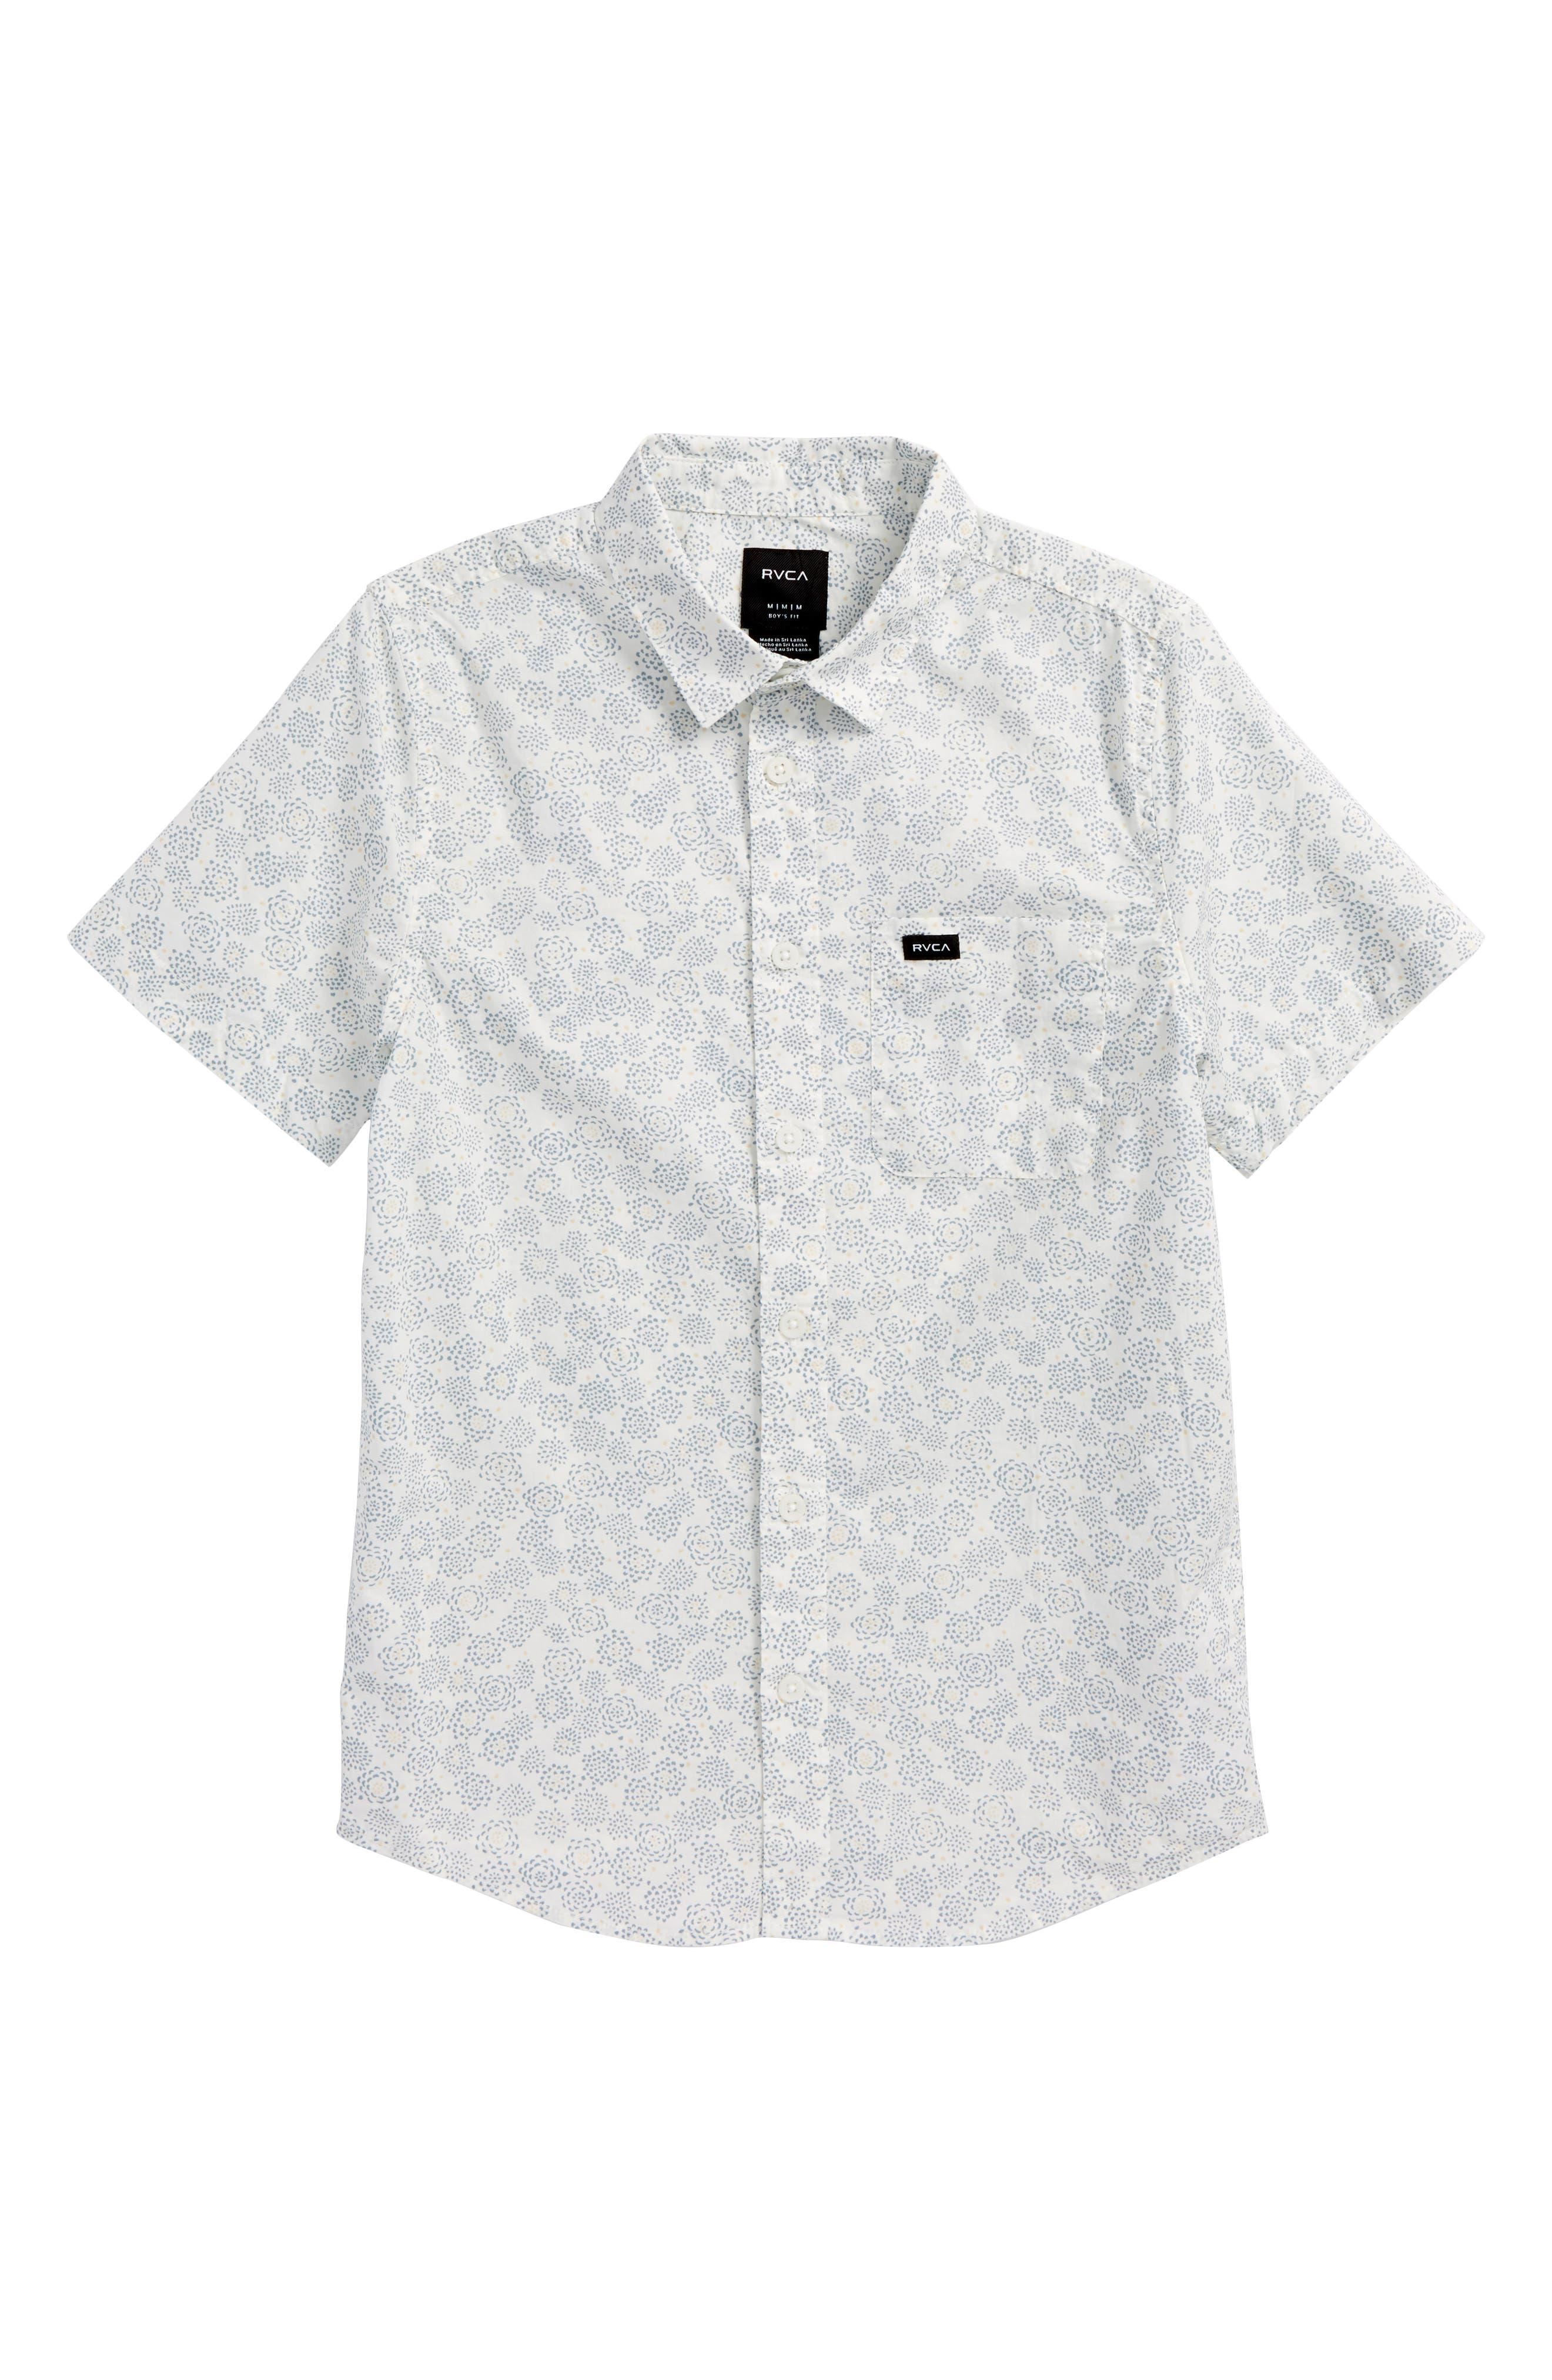 Cleta Woven Shirt,                         Main,                         color, Antique White